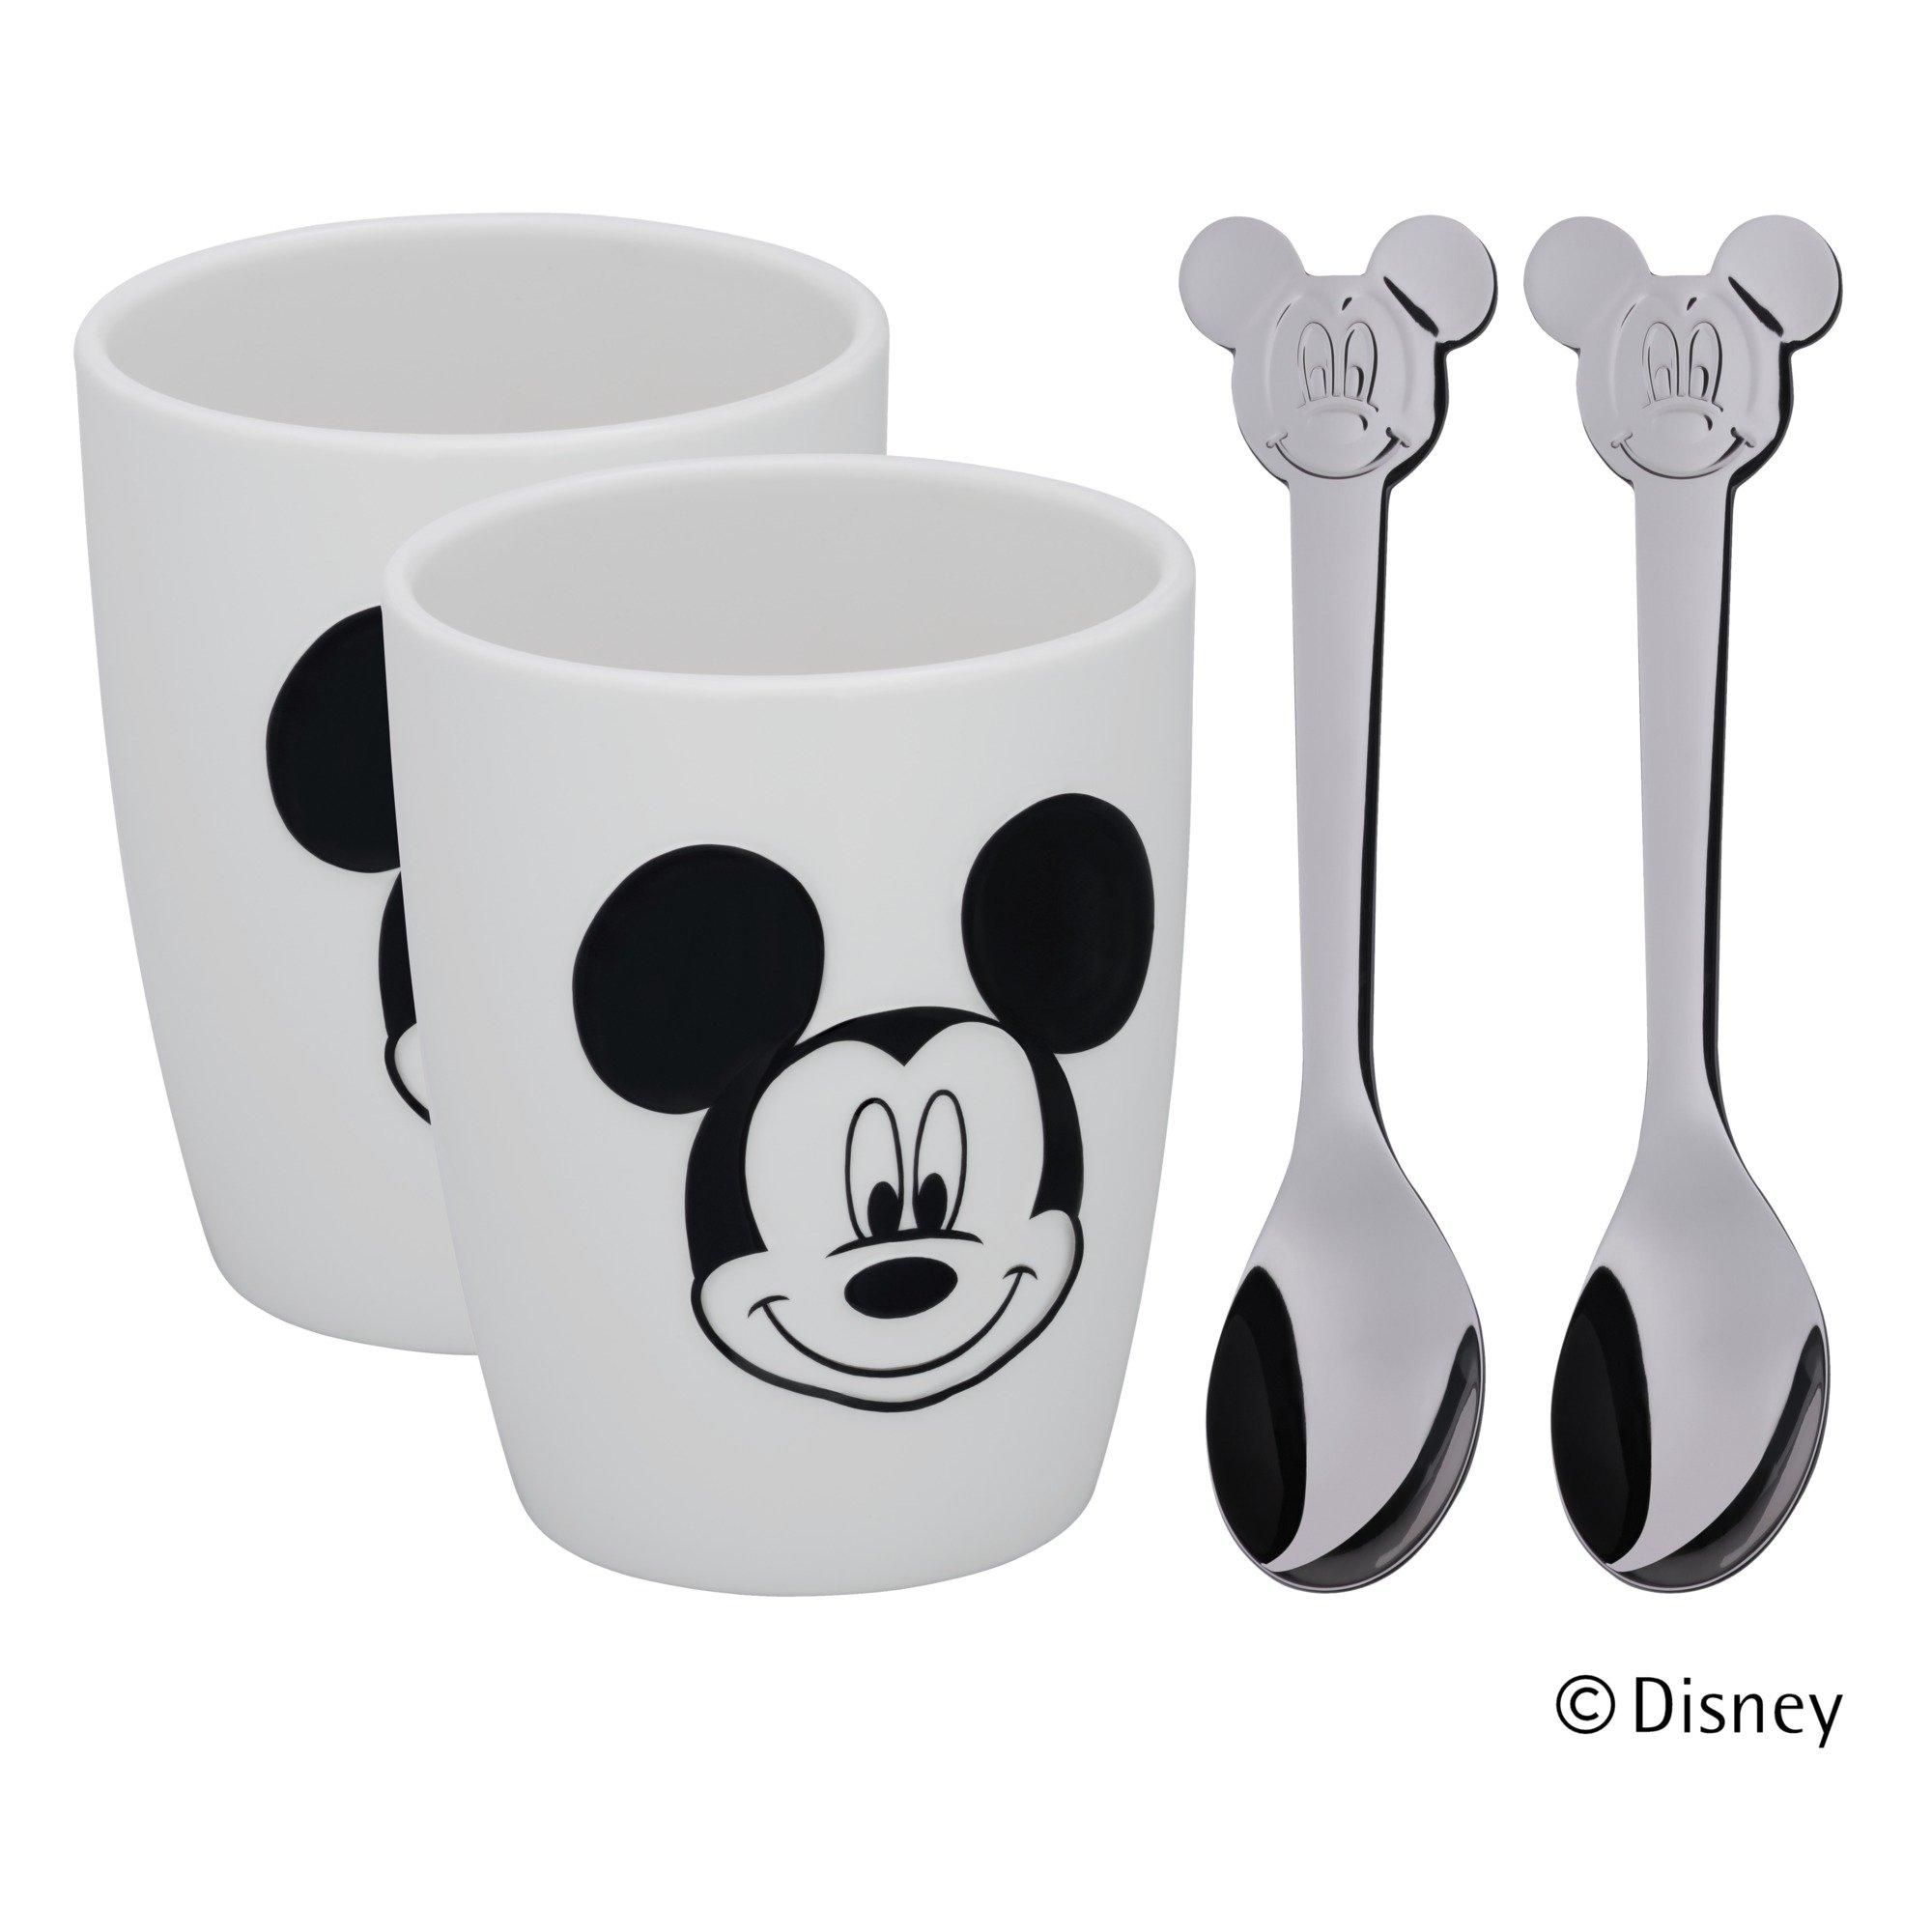 Tassen-Set M 4-teilig Mickey Mouse